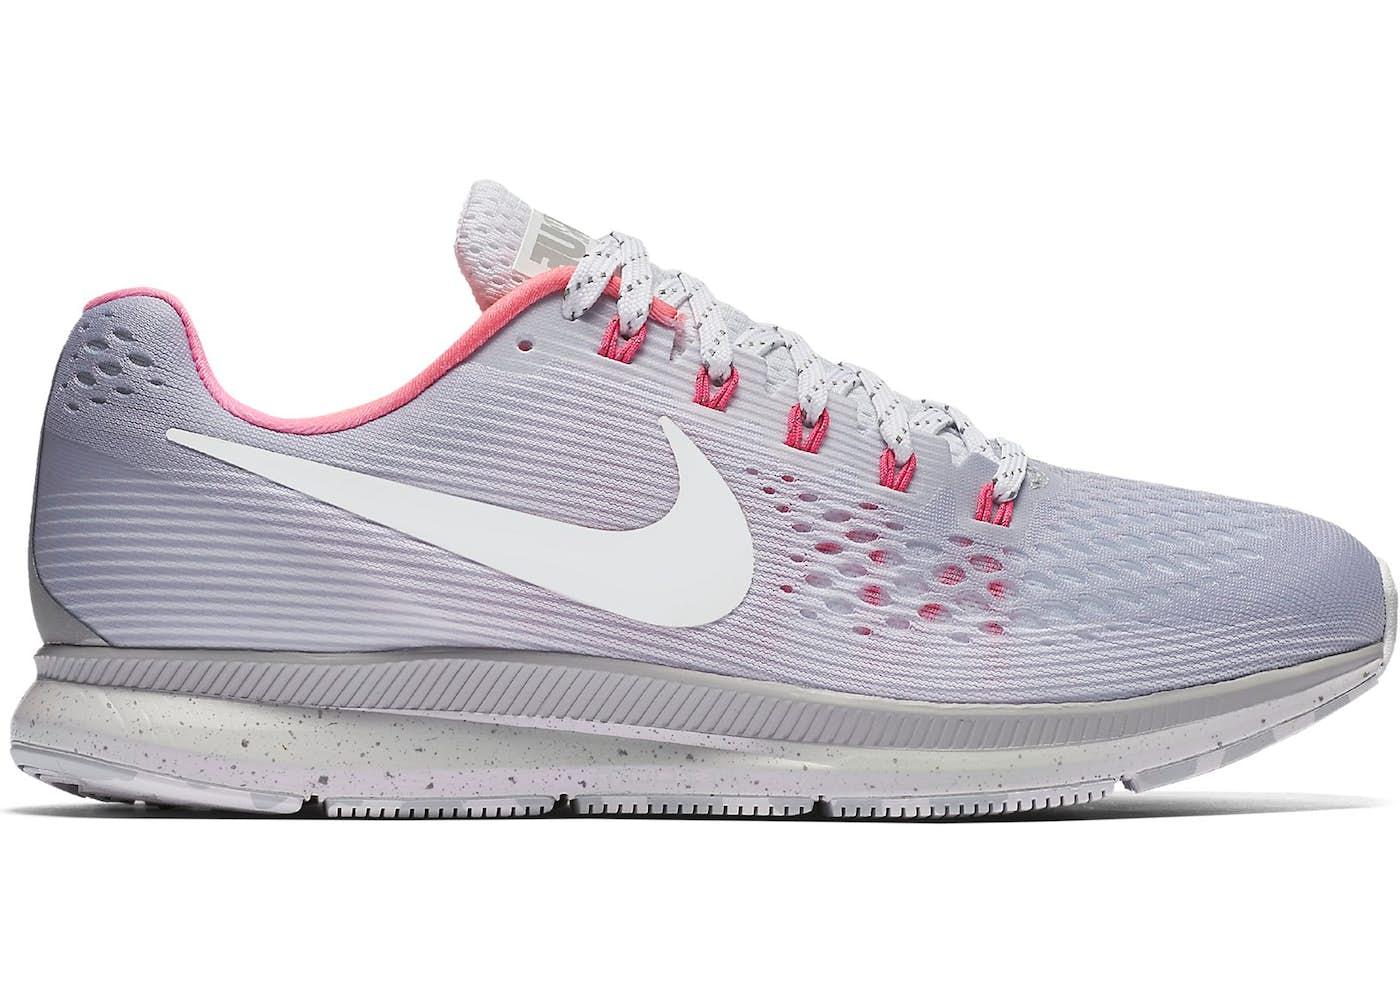 6a977eebcd05 Nike Free 6.0 V2 Running Shoes Mens